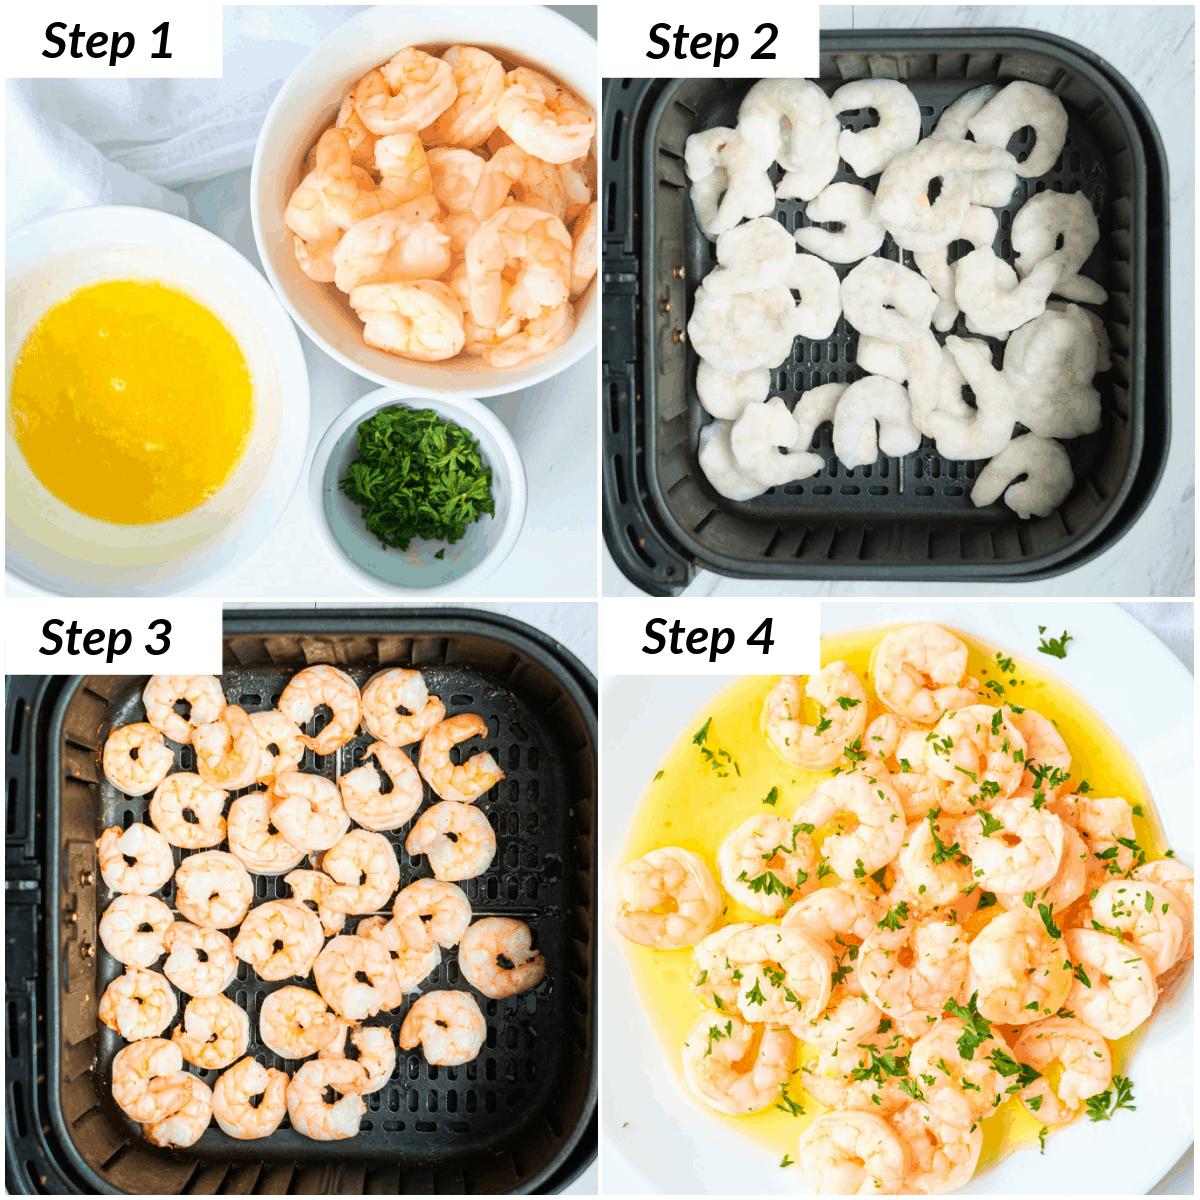 image collage showing the steps for making aier fryer garlic butter shrimp